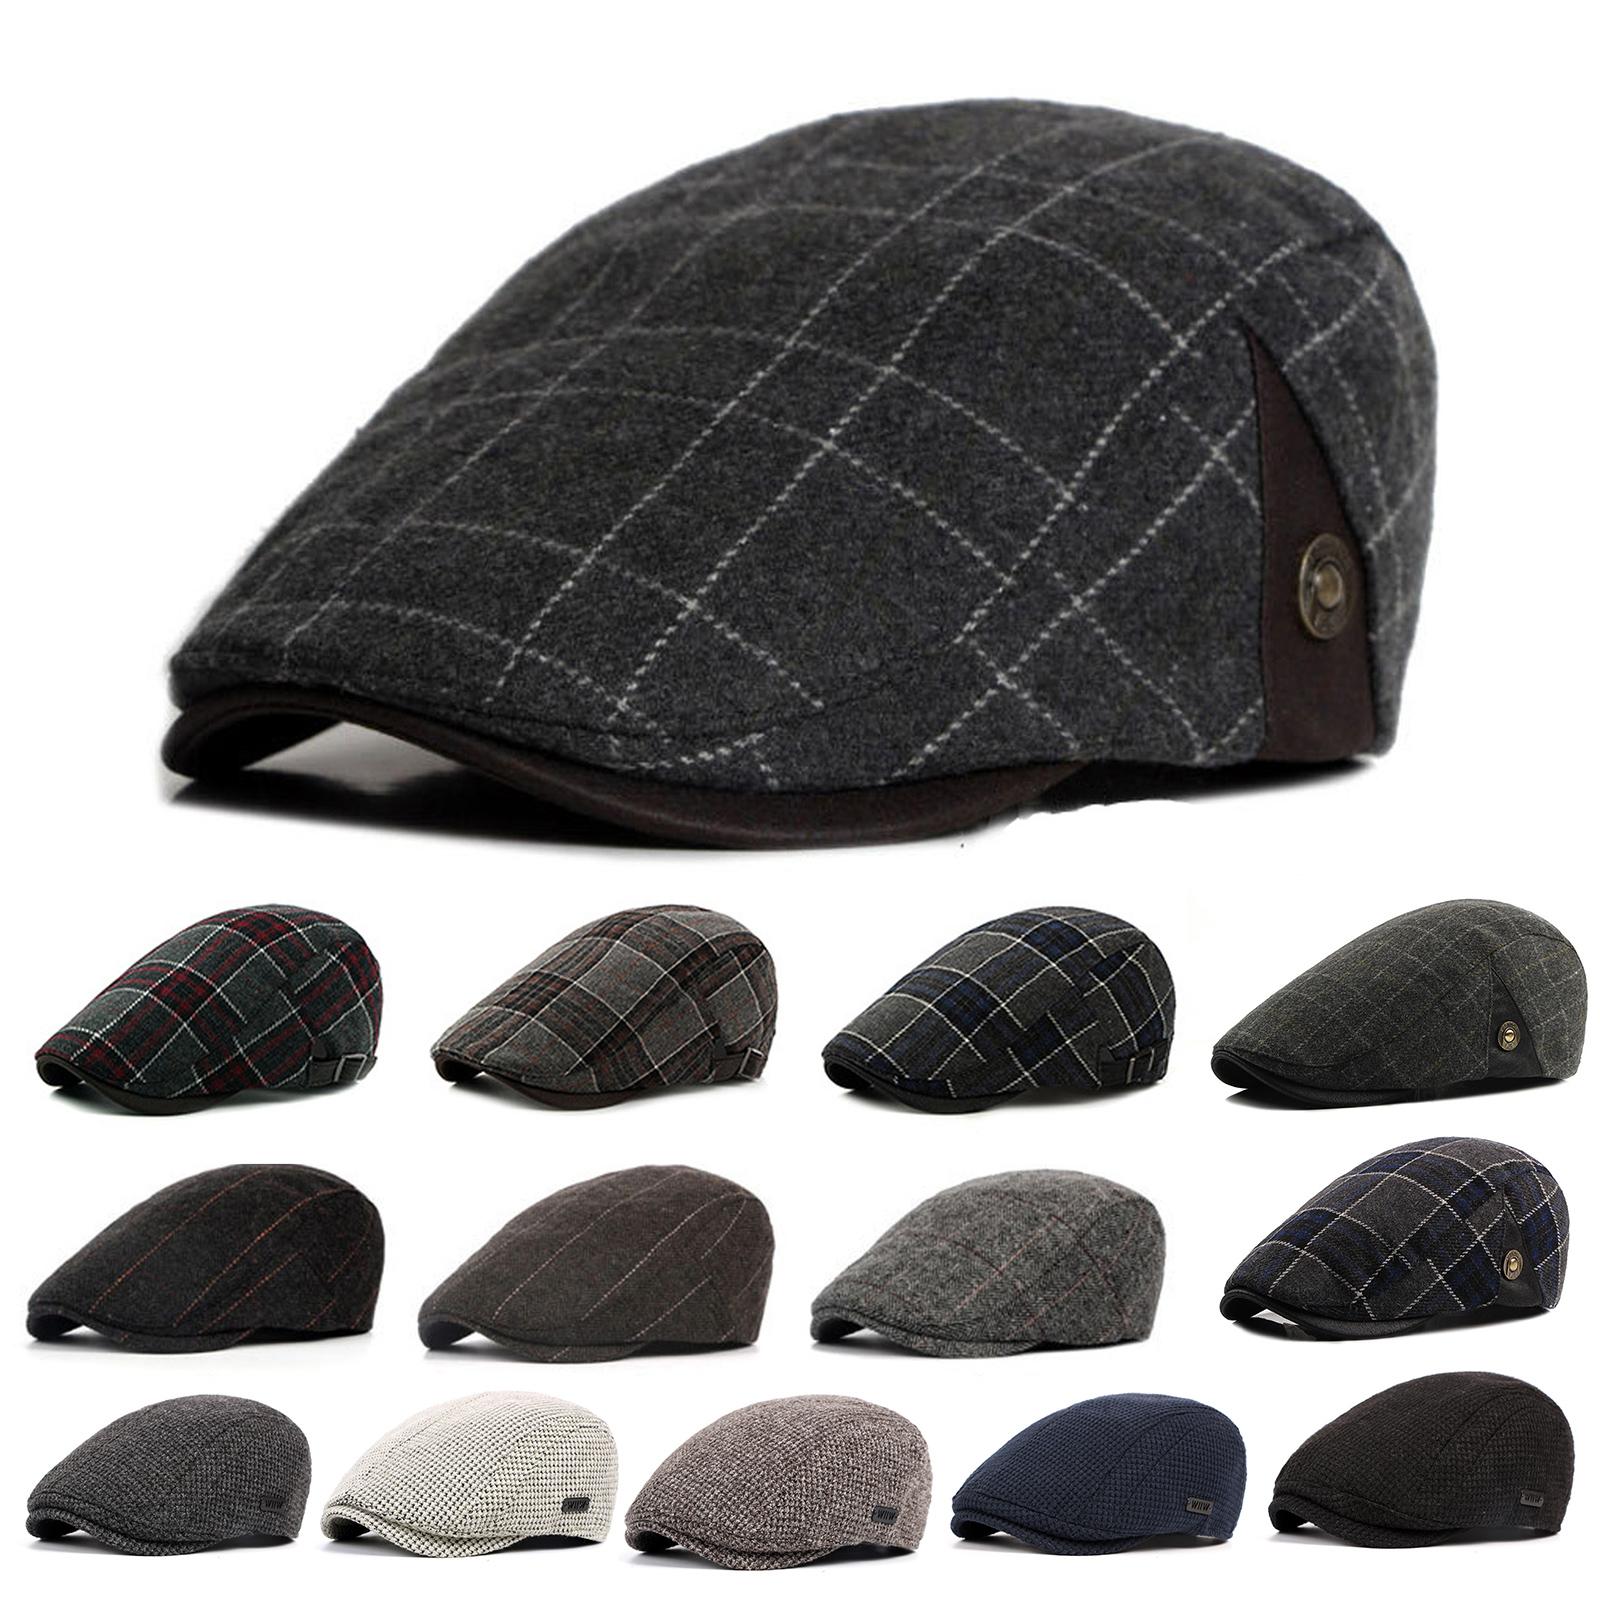 04b512b05de Details about Men Wool Blend Ivy Cap Tweed Herringbone Newsboy Gatsby Flat  Winter Warm Hat